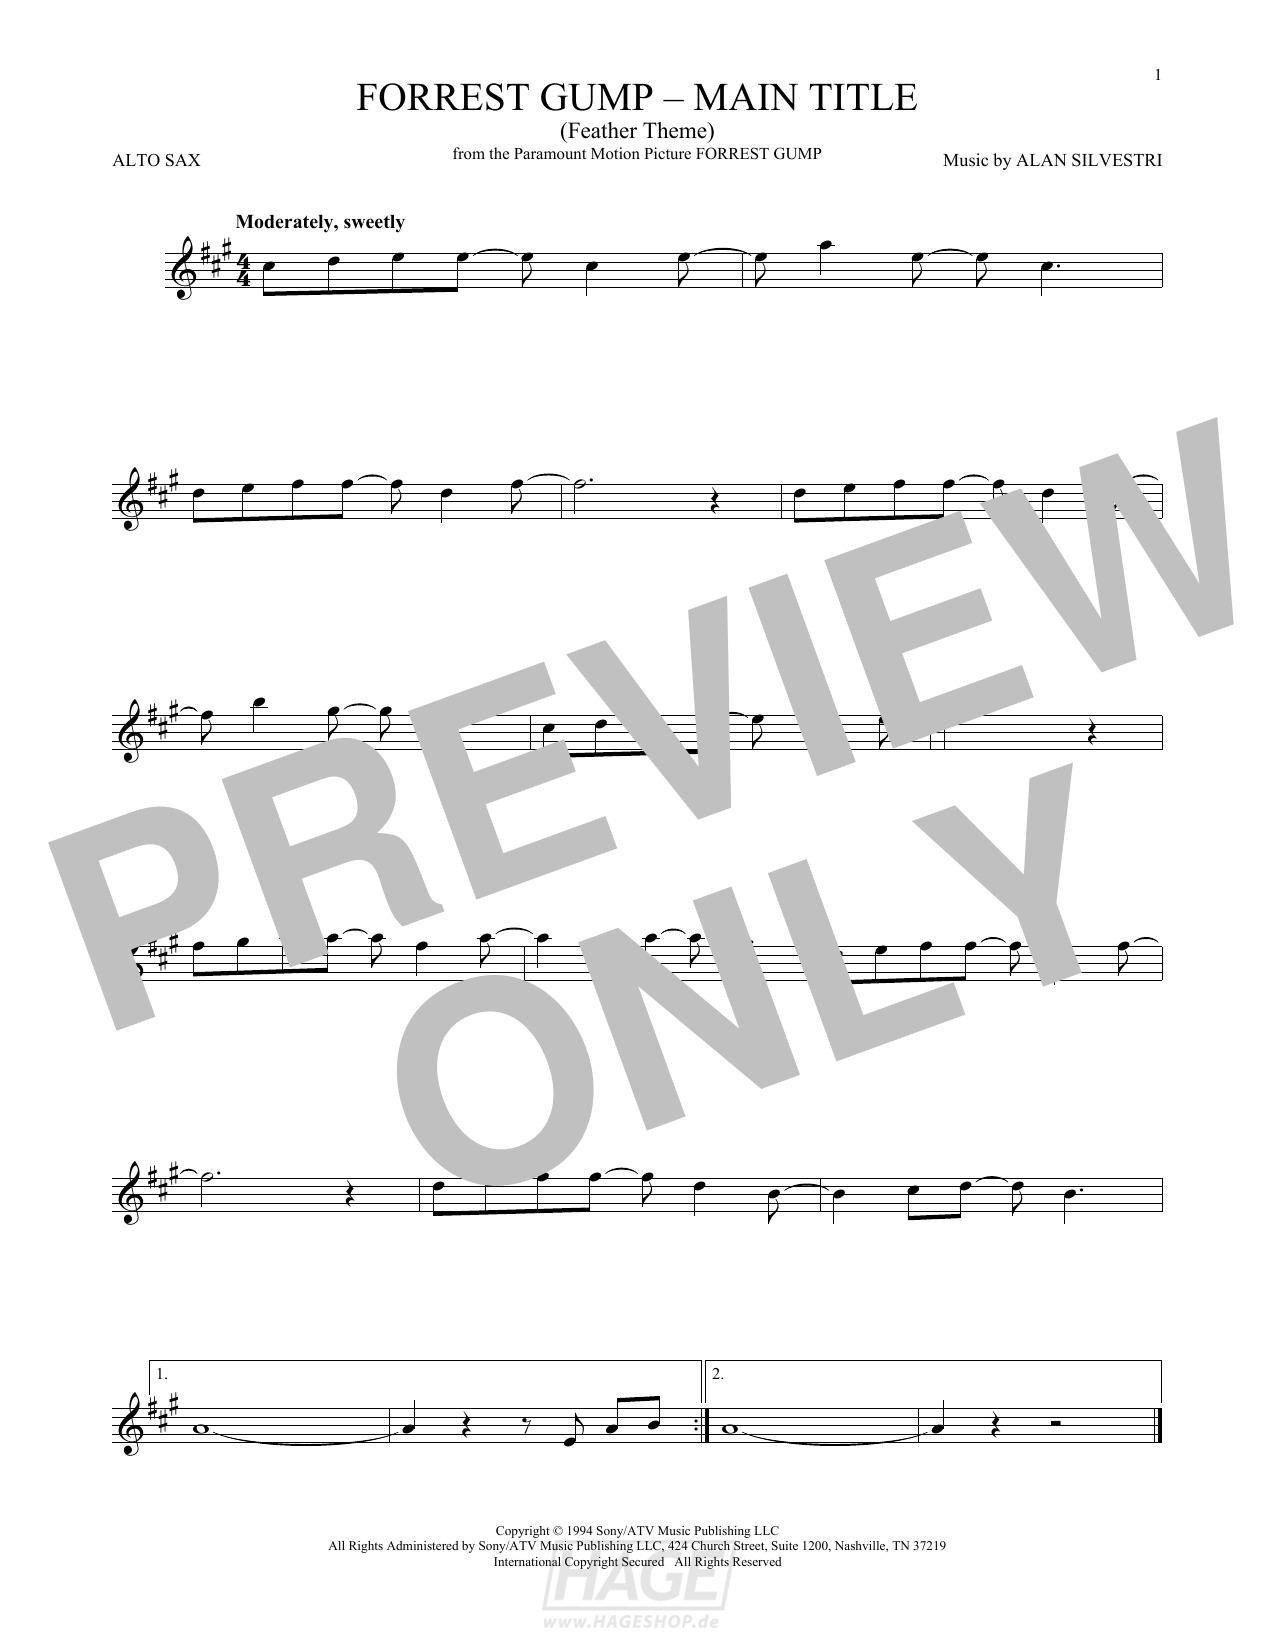 Forrest Gump - Main Title (Feather Theme) - Alan Silvestri - Noten Druckvorschau